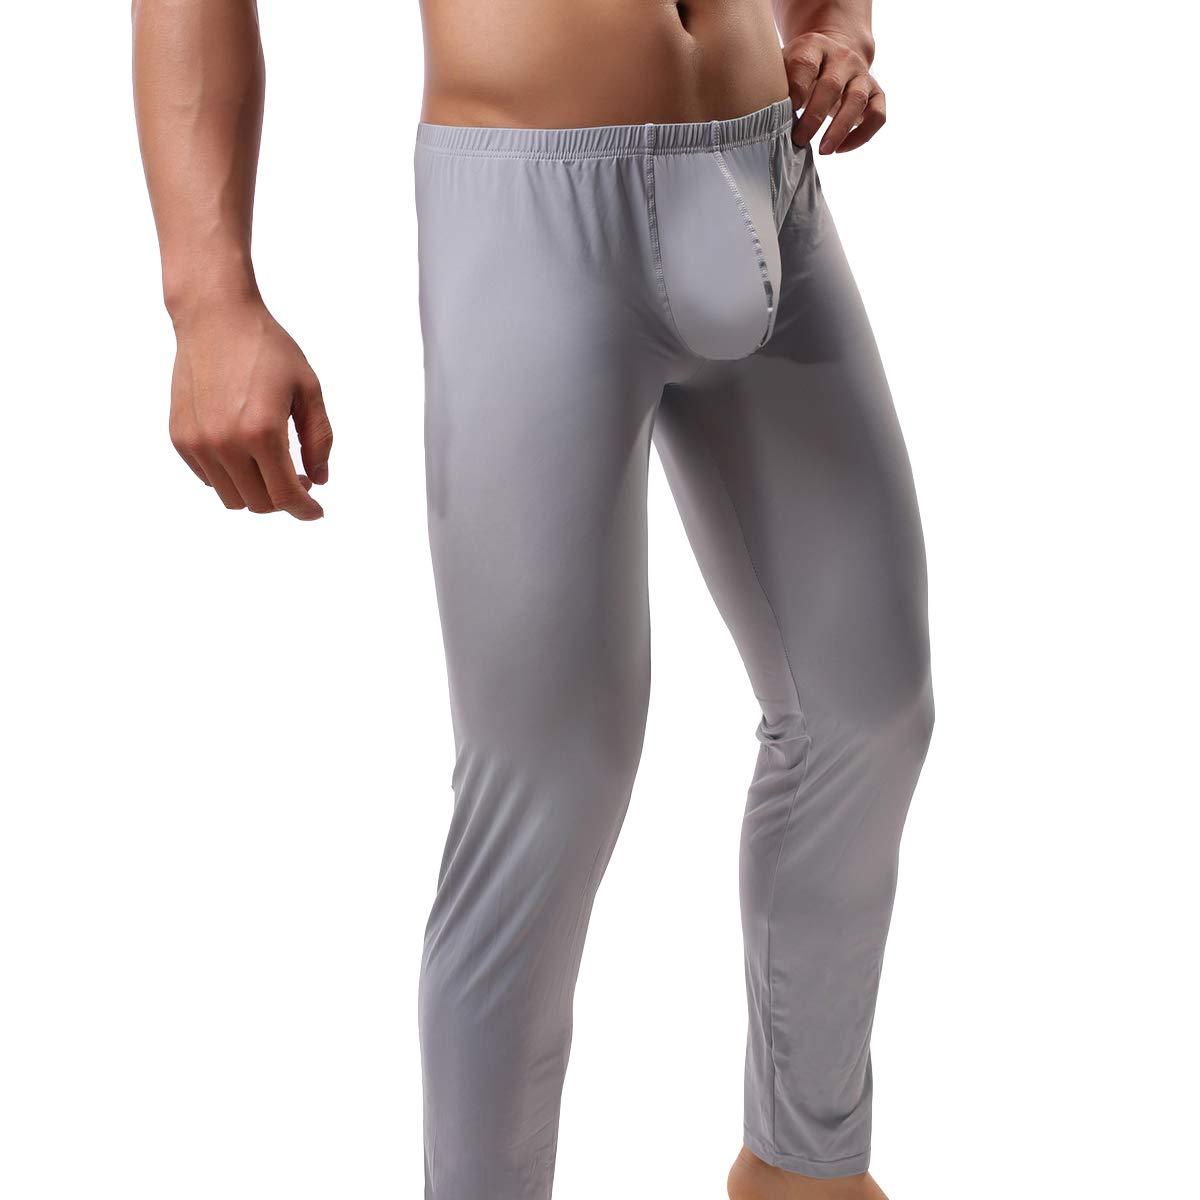 QiaTi Men's Tight Long Underwear Sexy Long Pants Sexy Tight Underwear Soft Compression Underwear for Men Long Leggings Pants (Large(fits Like US Medium), New Grey) by QiaTi